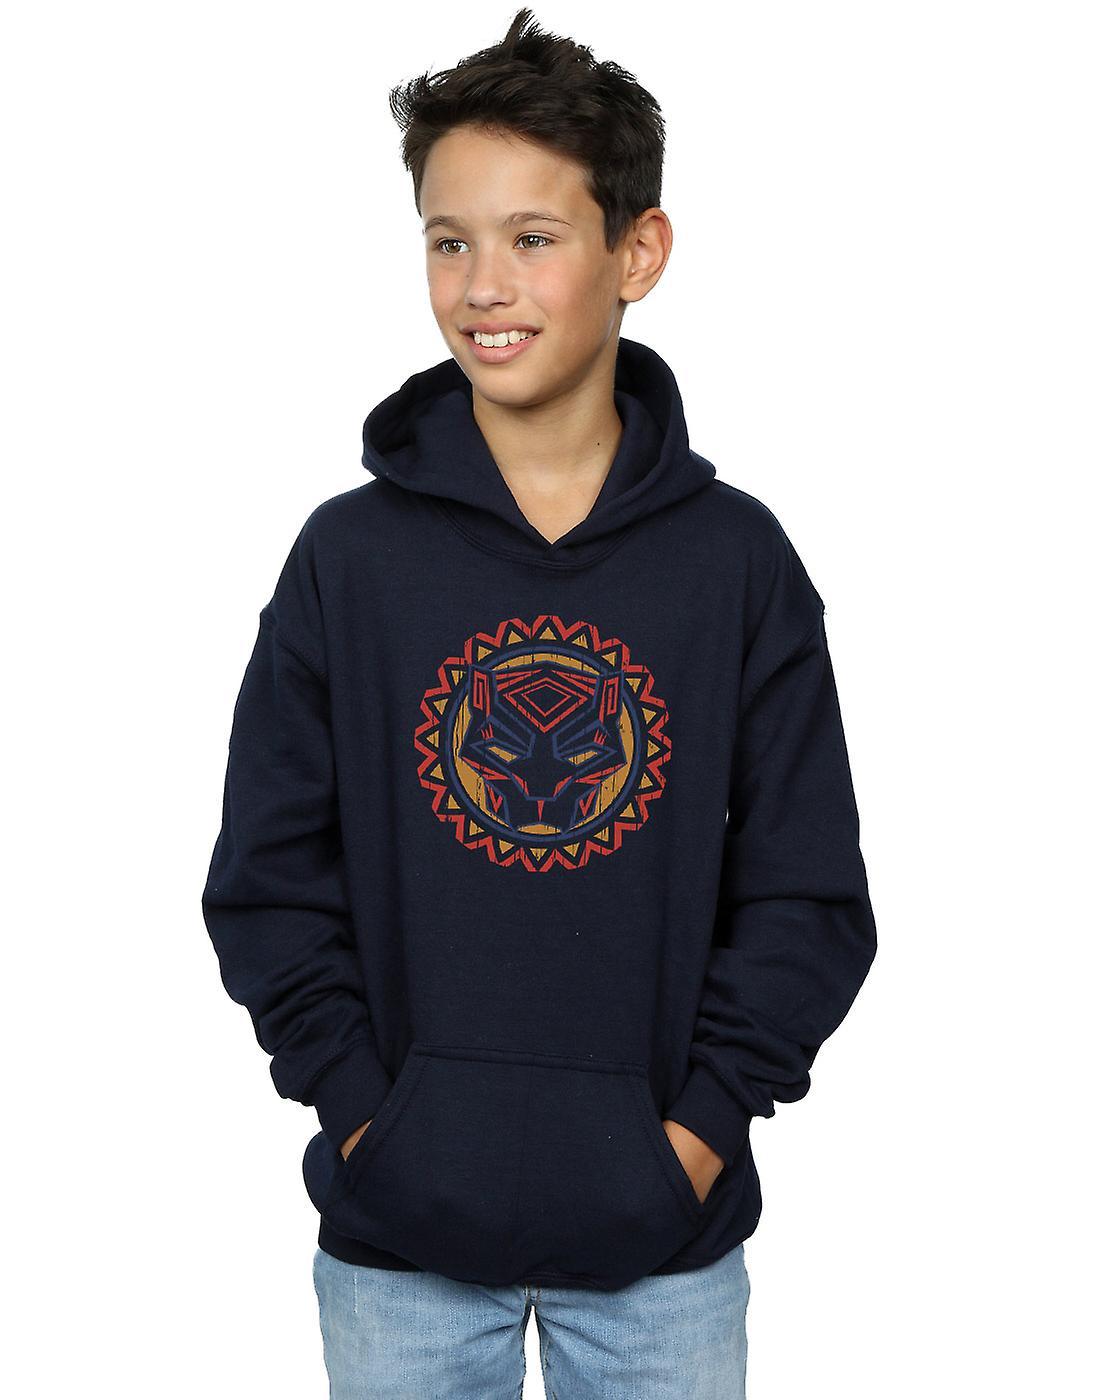 Merveille garçons noir Panther Tribal Panther icône Hoodie